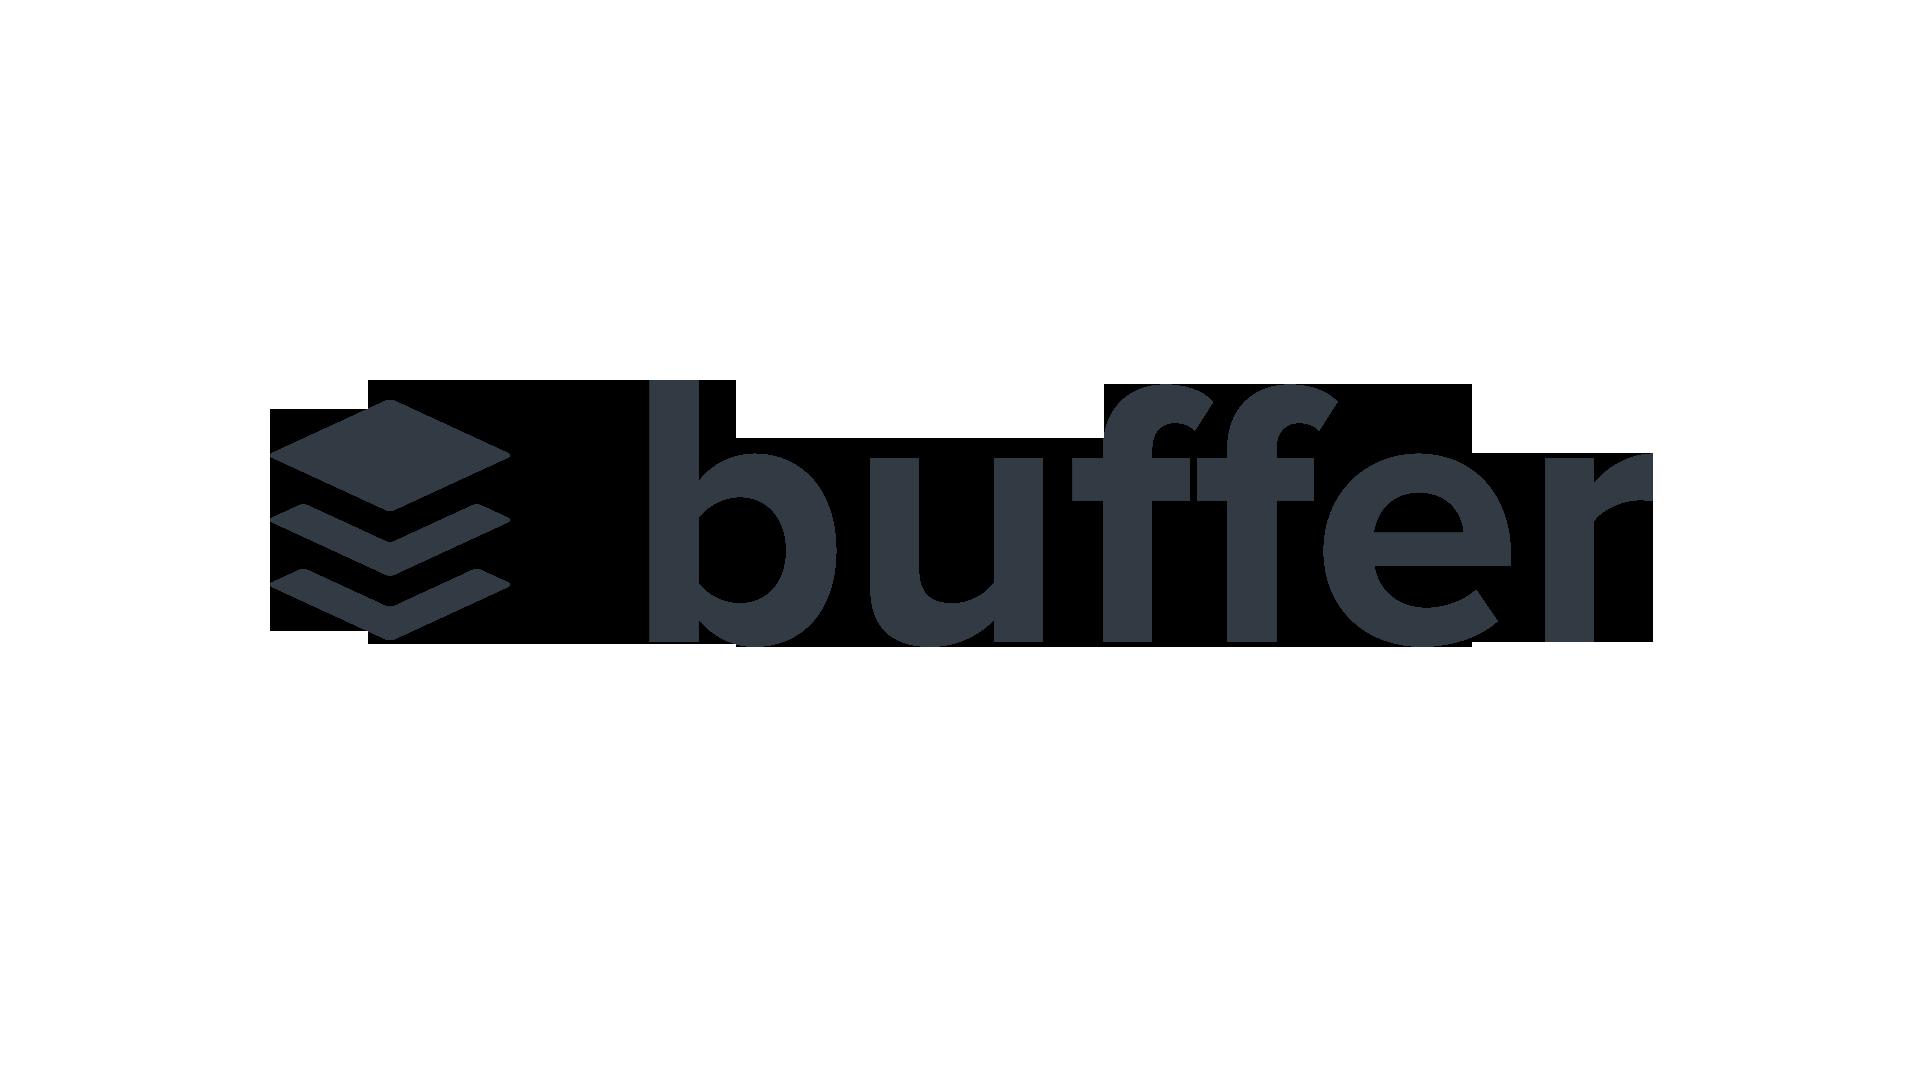 Biffer logo